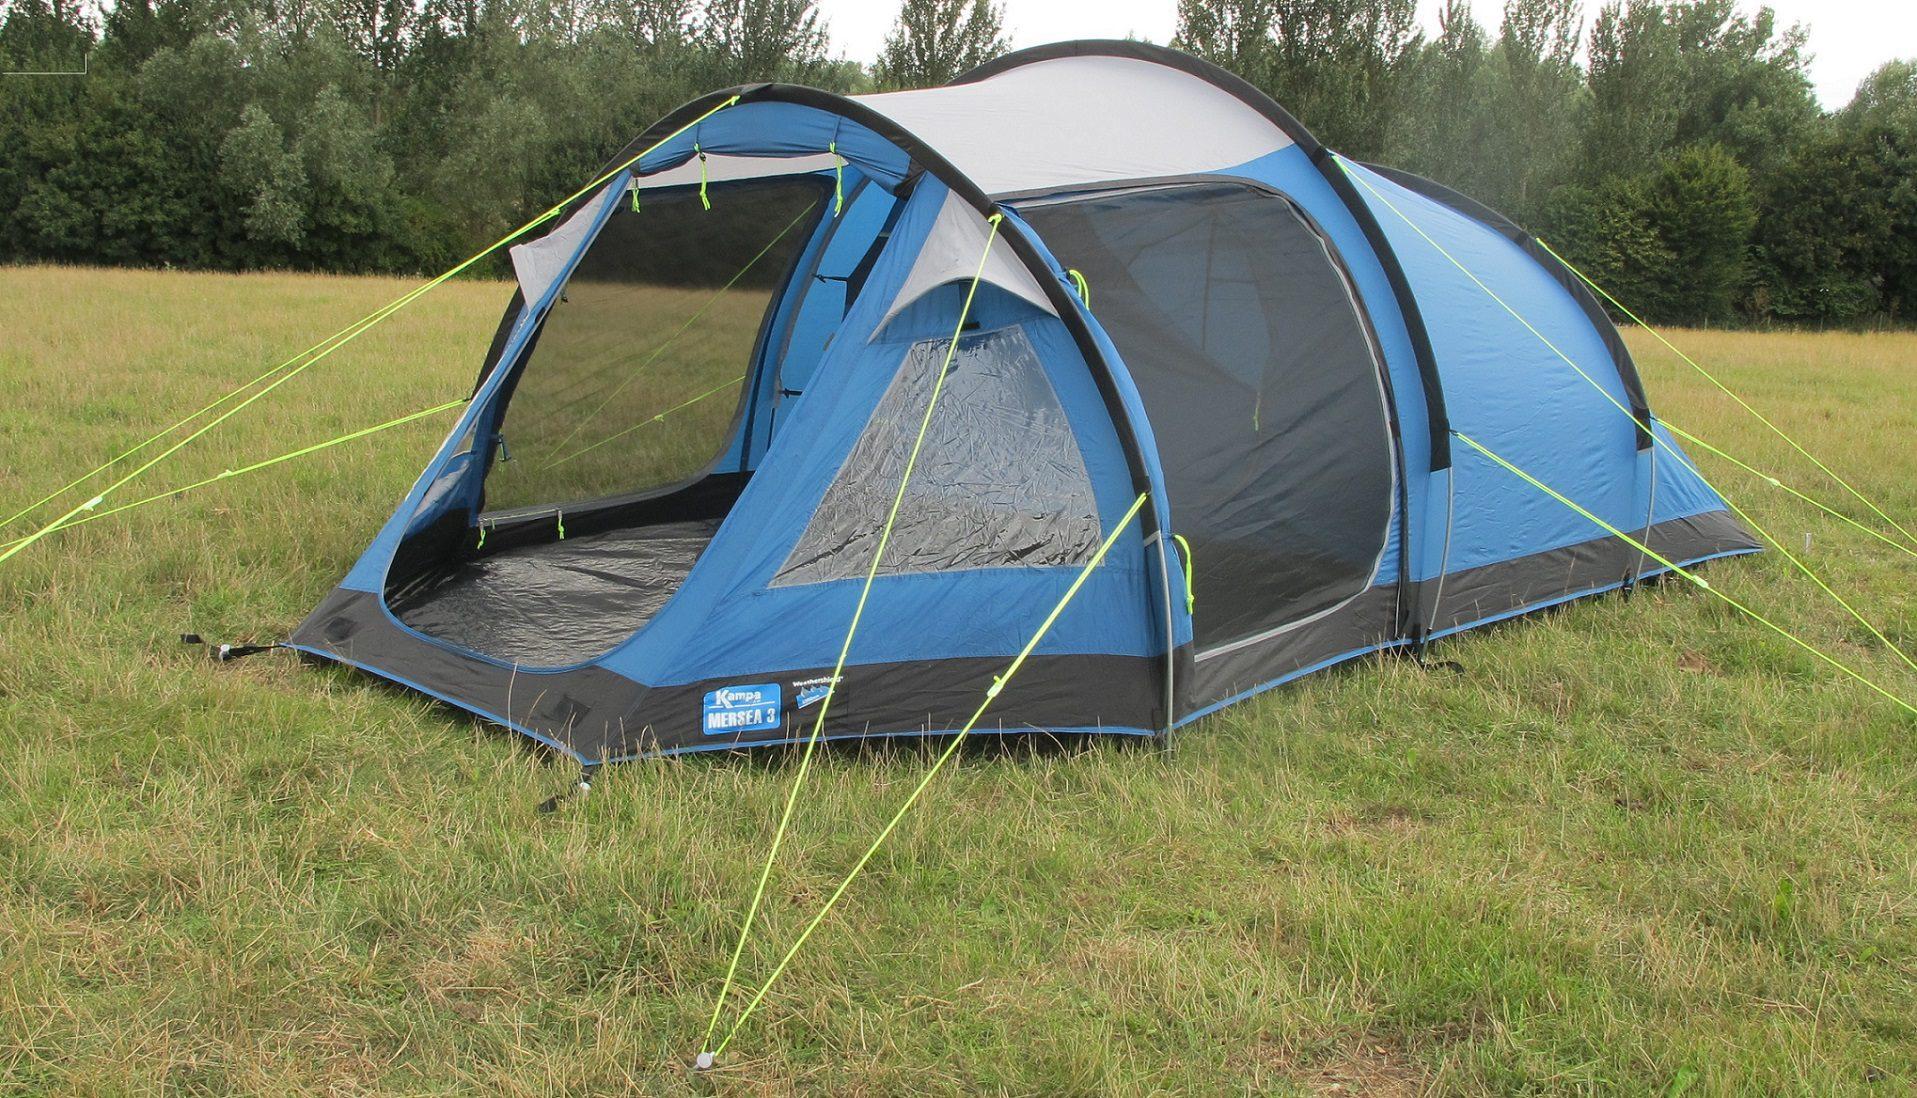 Kampa Mersea 3 Tent 2016 - CT0095